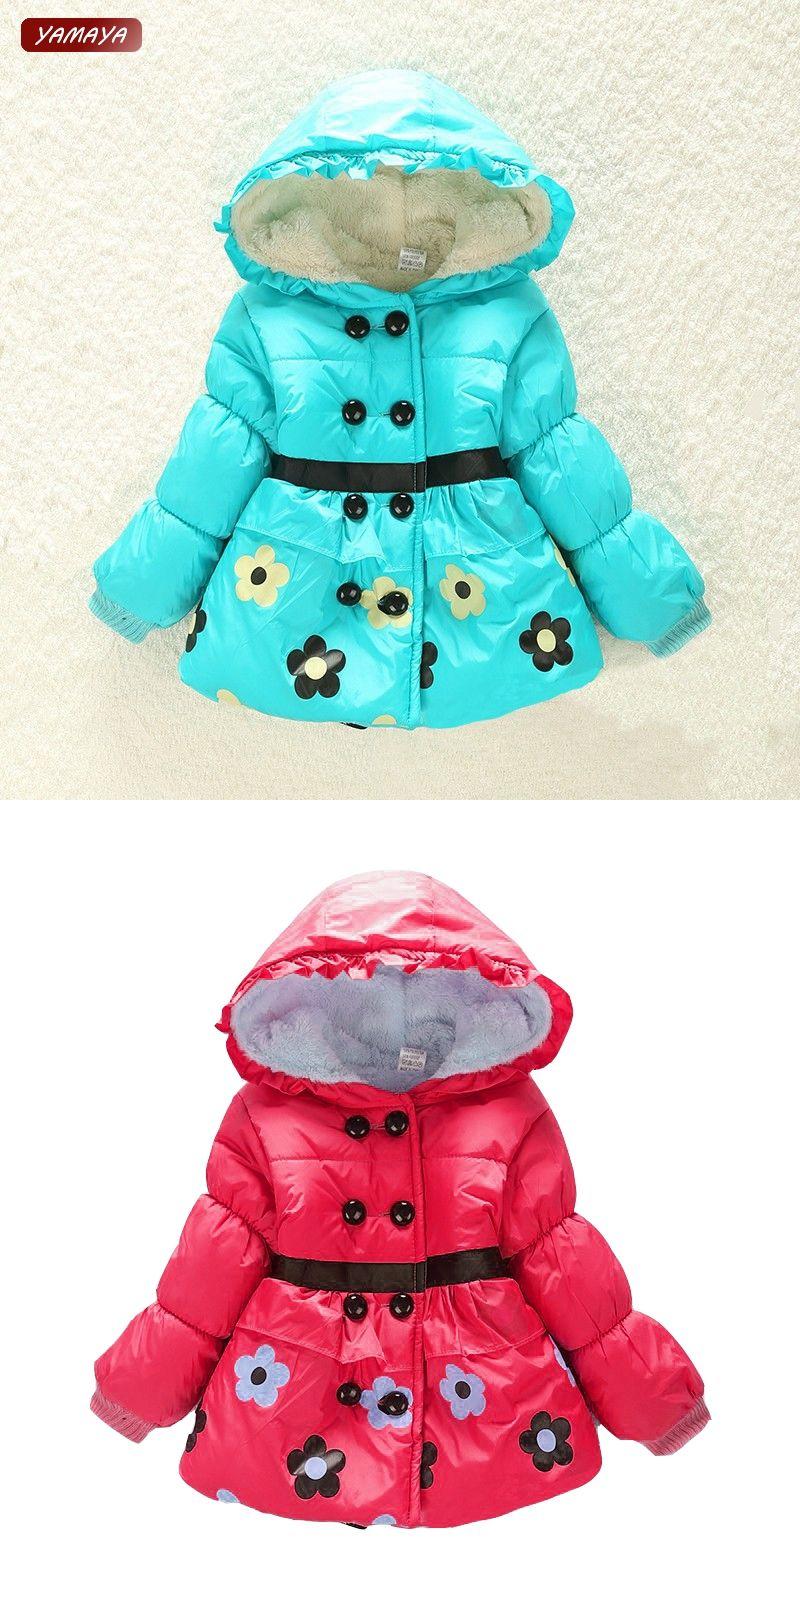 439a0c0ed NEW 2016 kids jackets baby snowsuit girls winter snowsuit winter ...